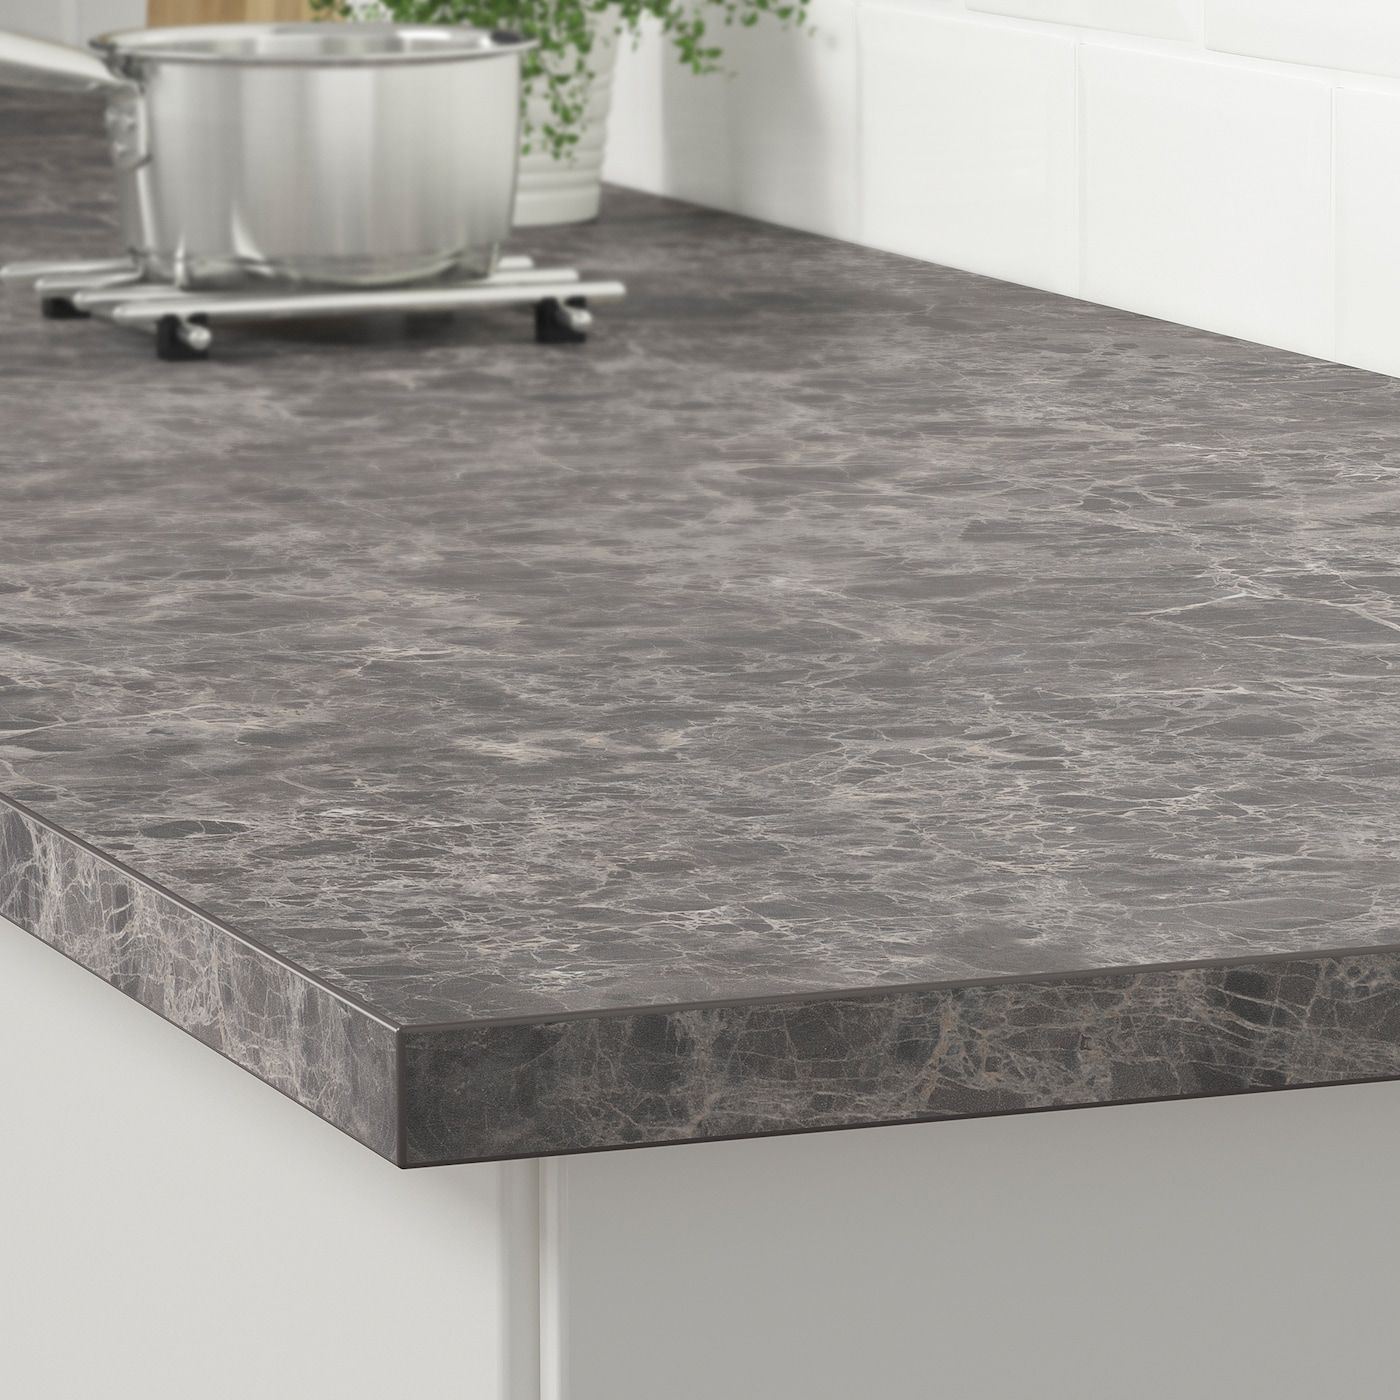 Ekbacken Countertop Dark Gray Marble Effect Laminate Marble Effect Laminate 74x1 1 8